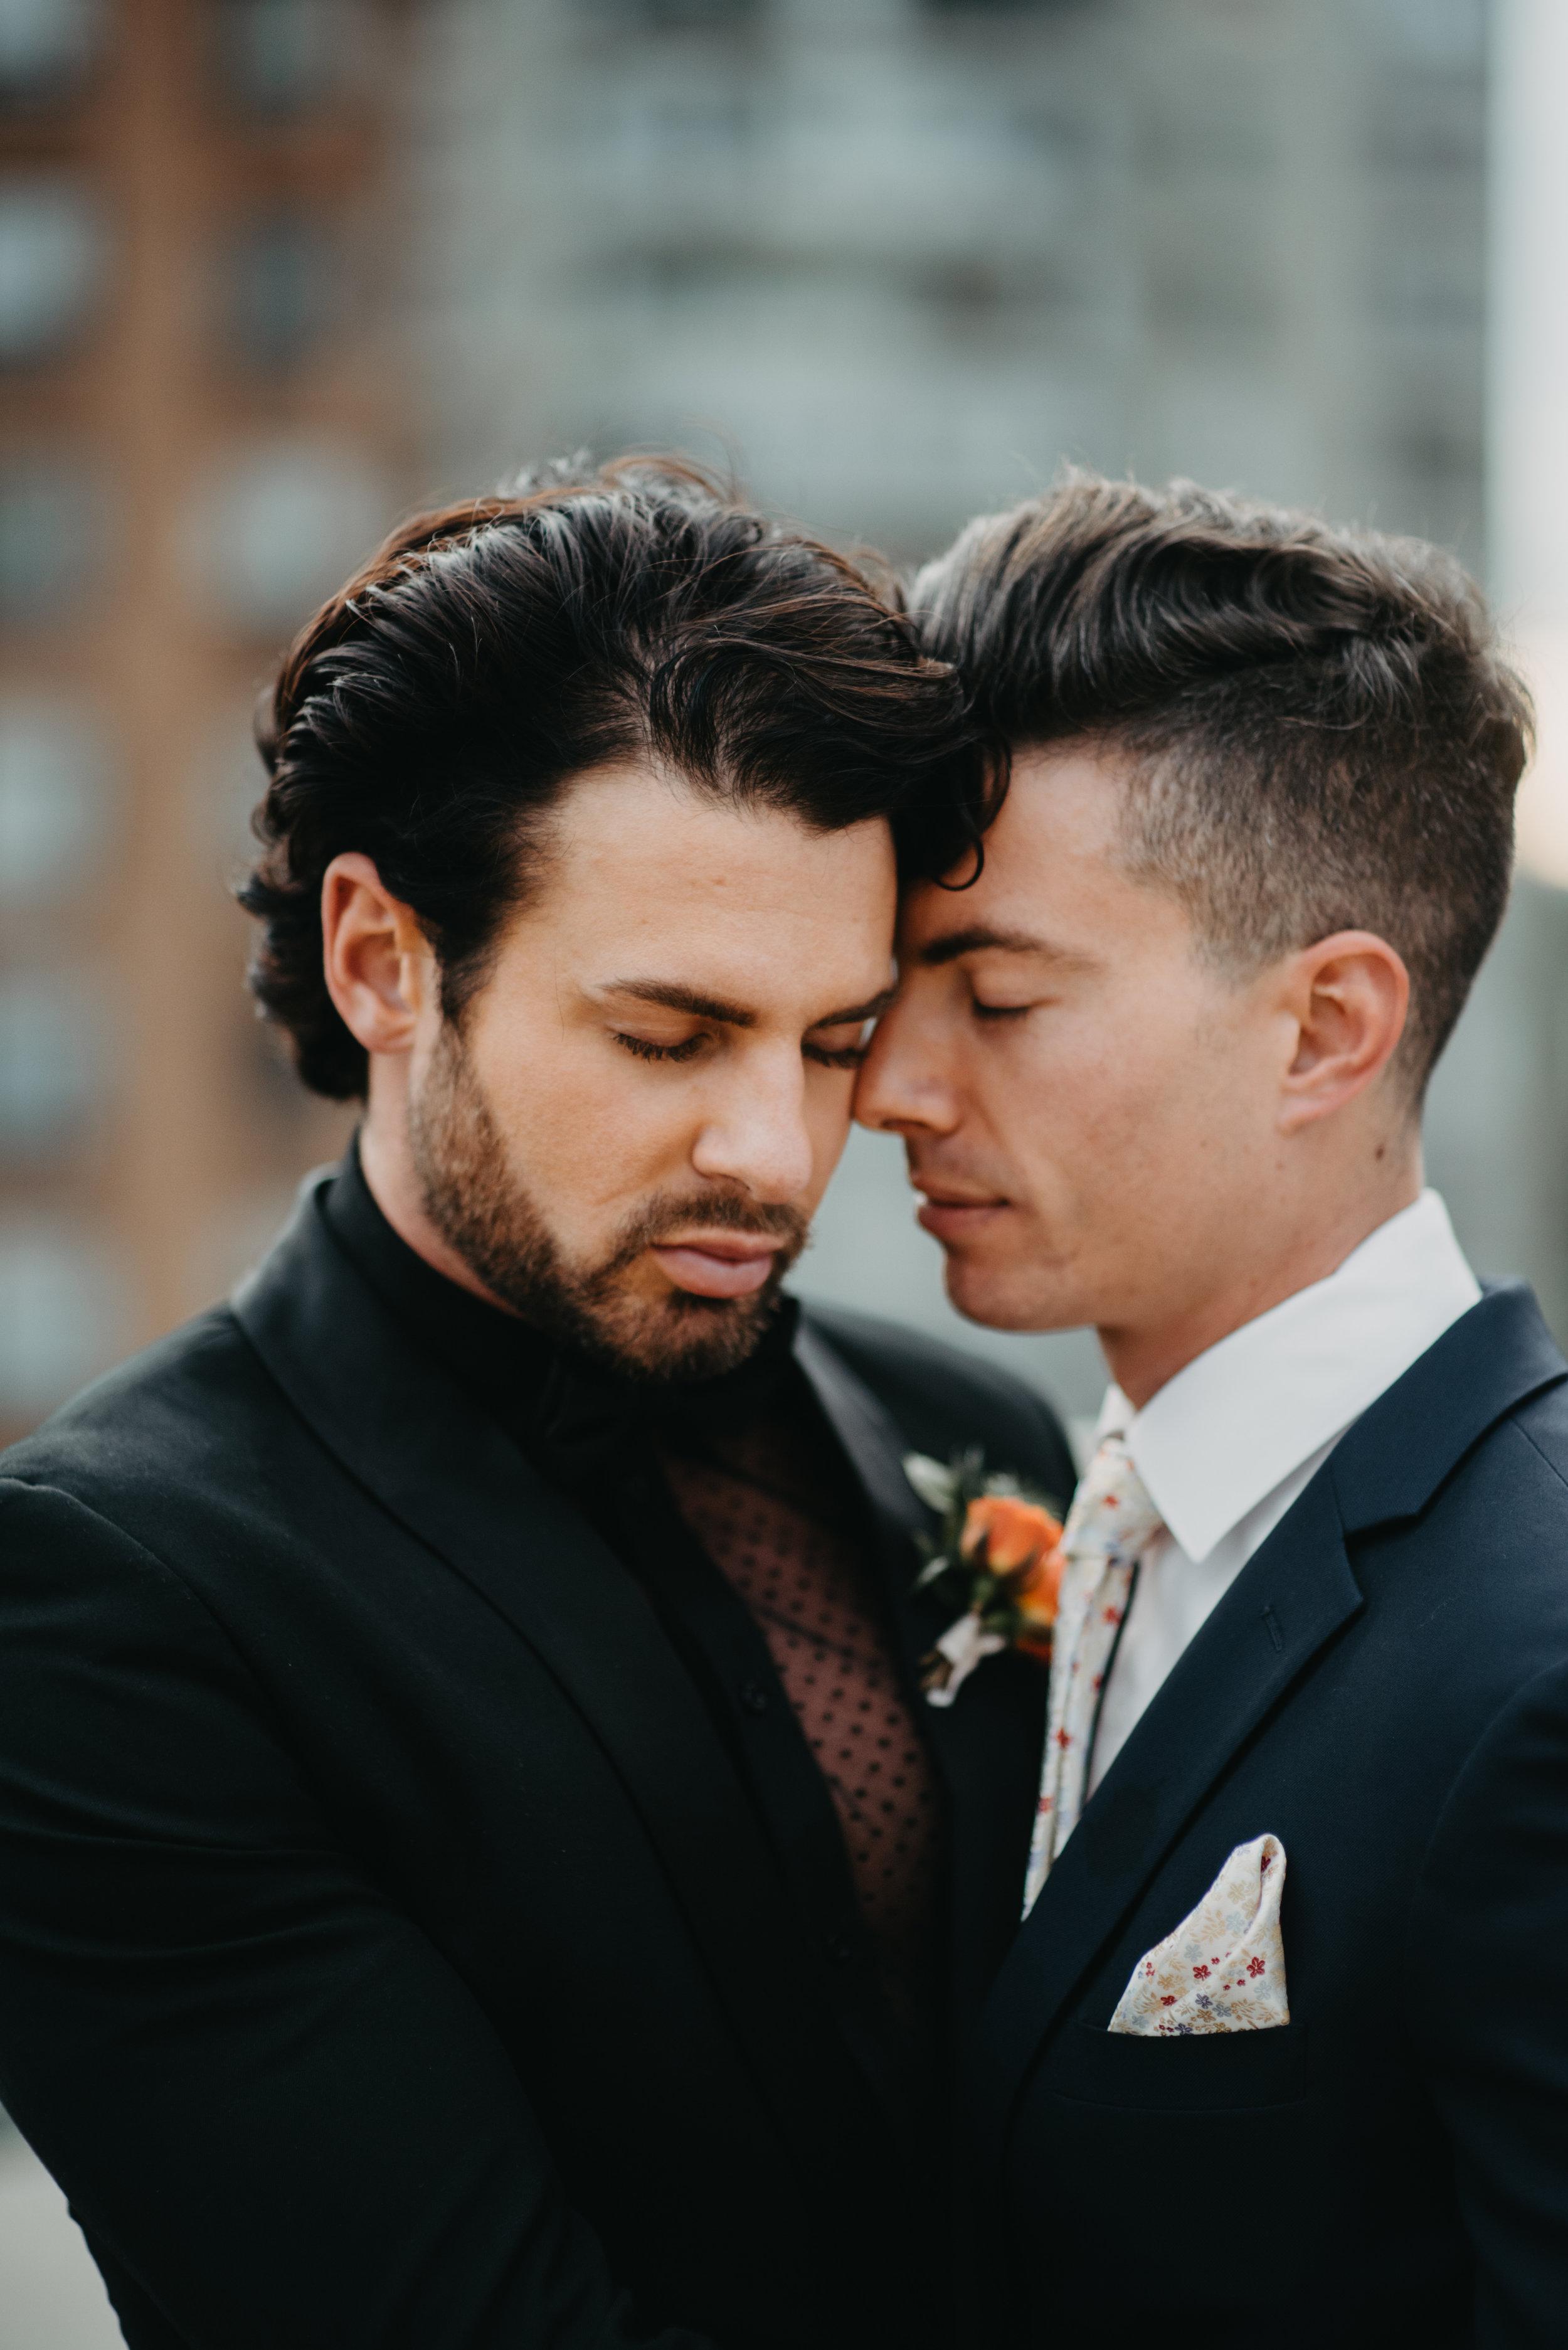 Gay_Toronto_Photoshoot-83798.jpg